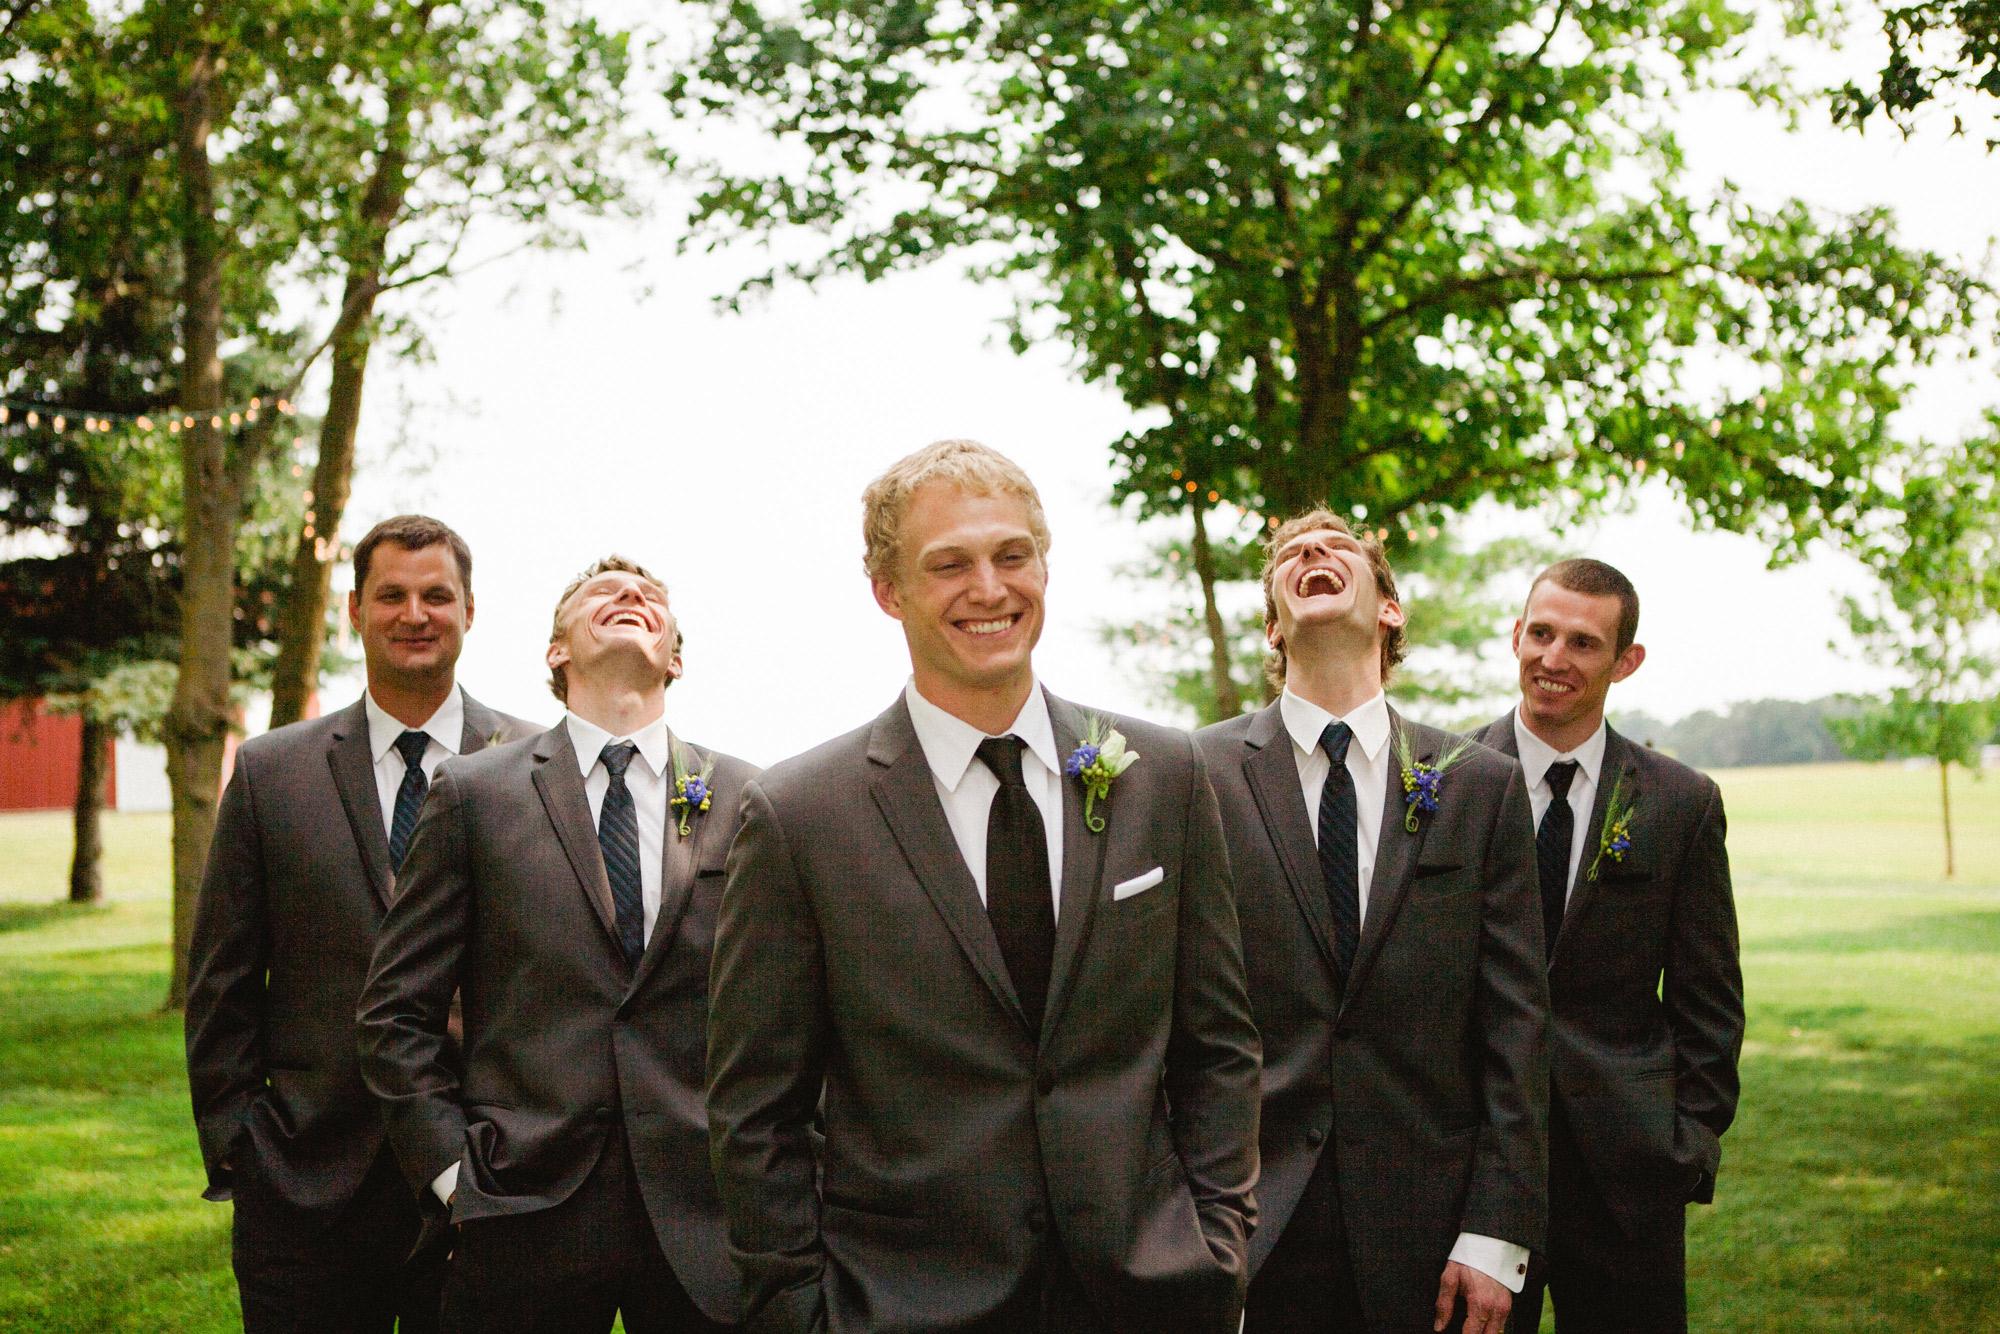 Wedding-Party-0170